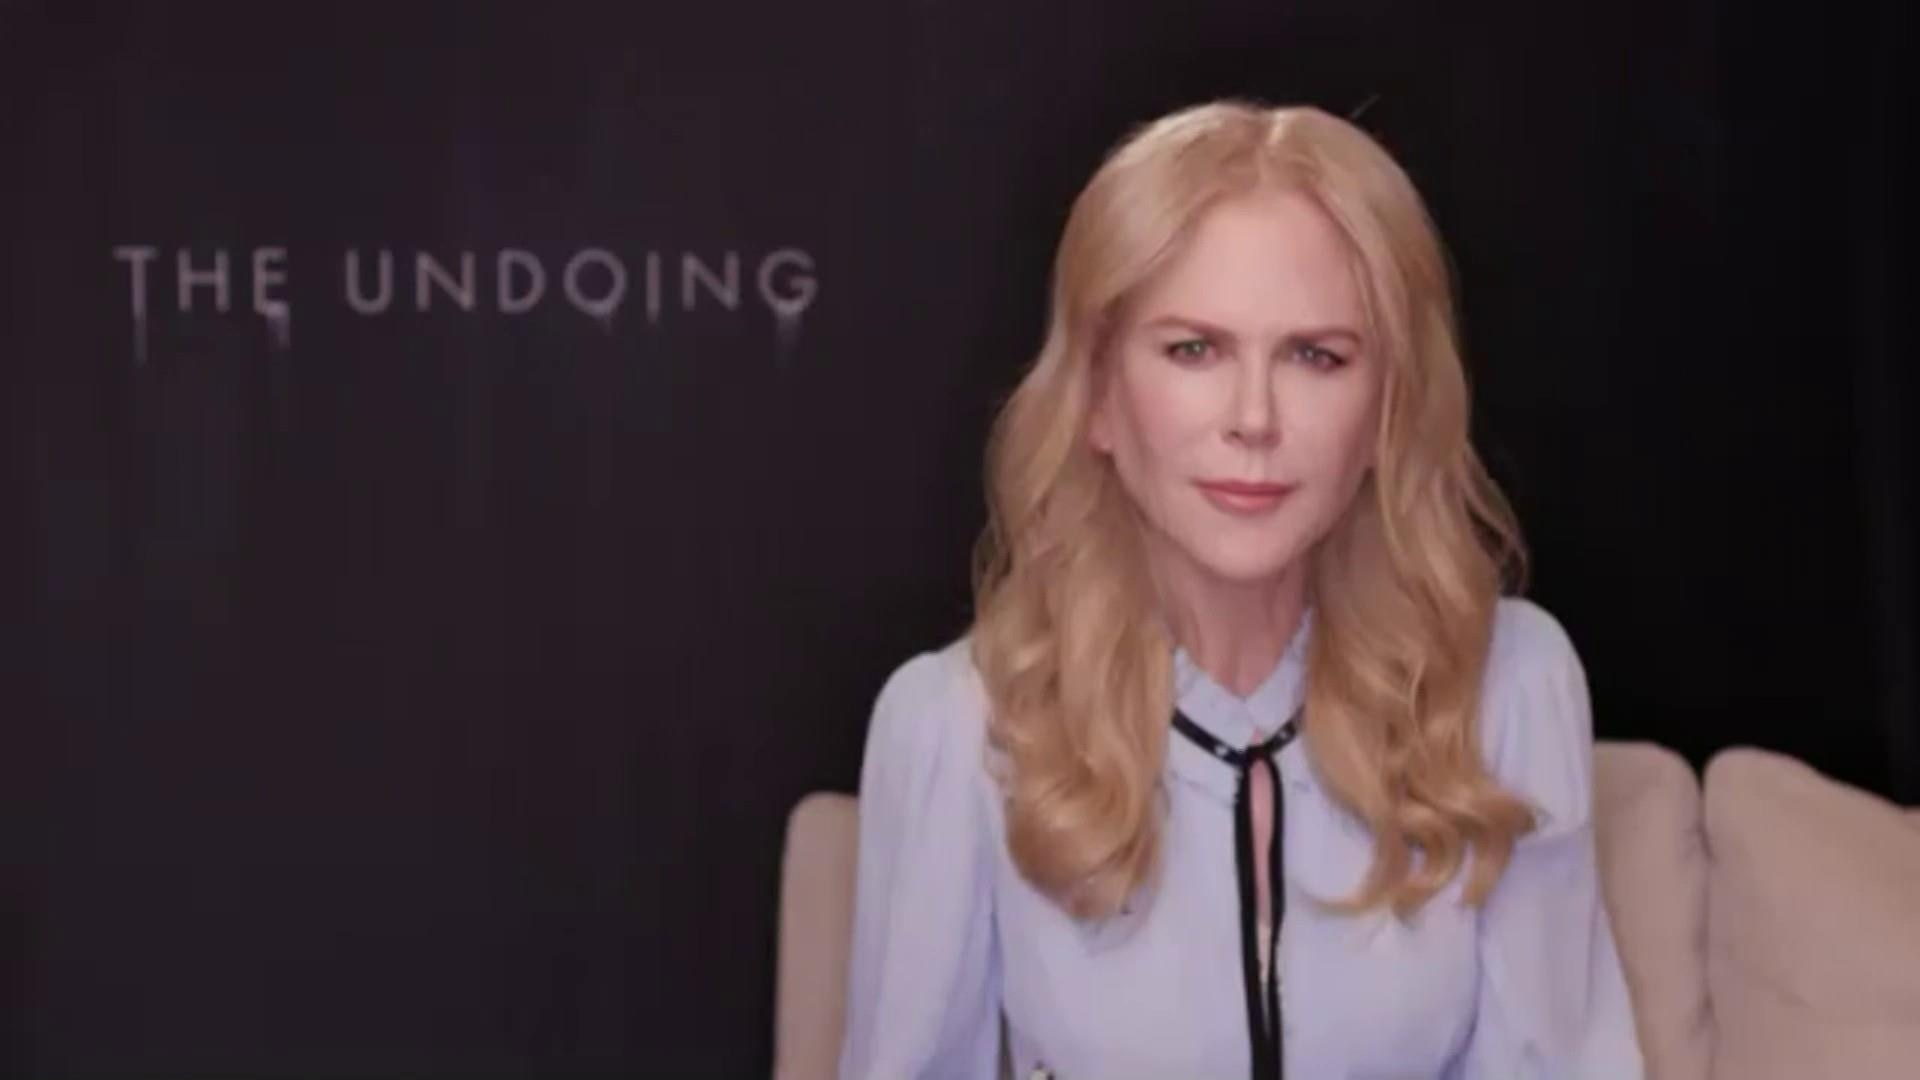 Watch TODAY Highlight: Nicole Kidman on 'The Undoing' and ...The Undoing